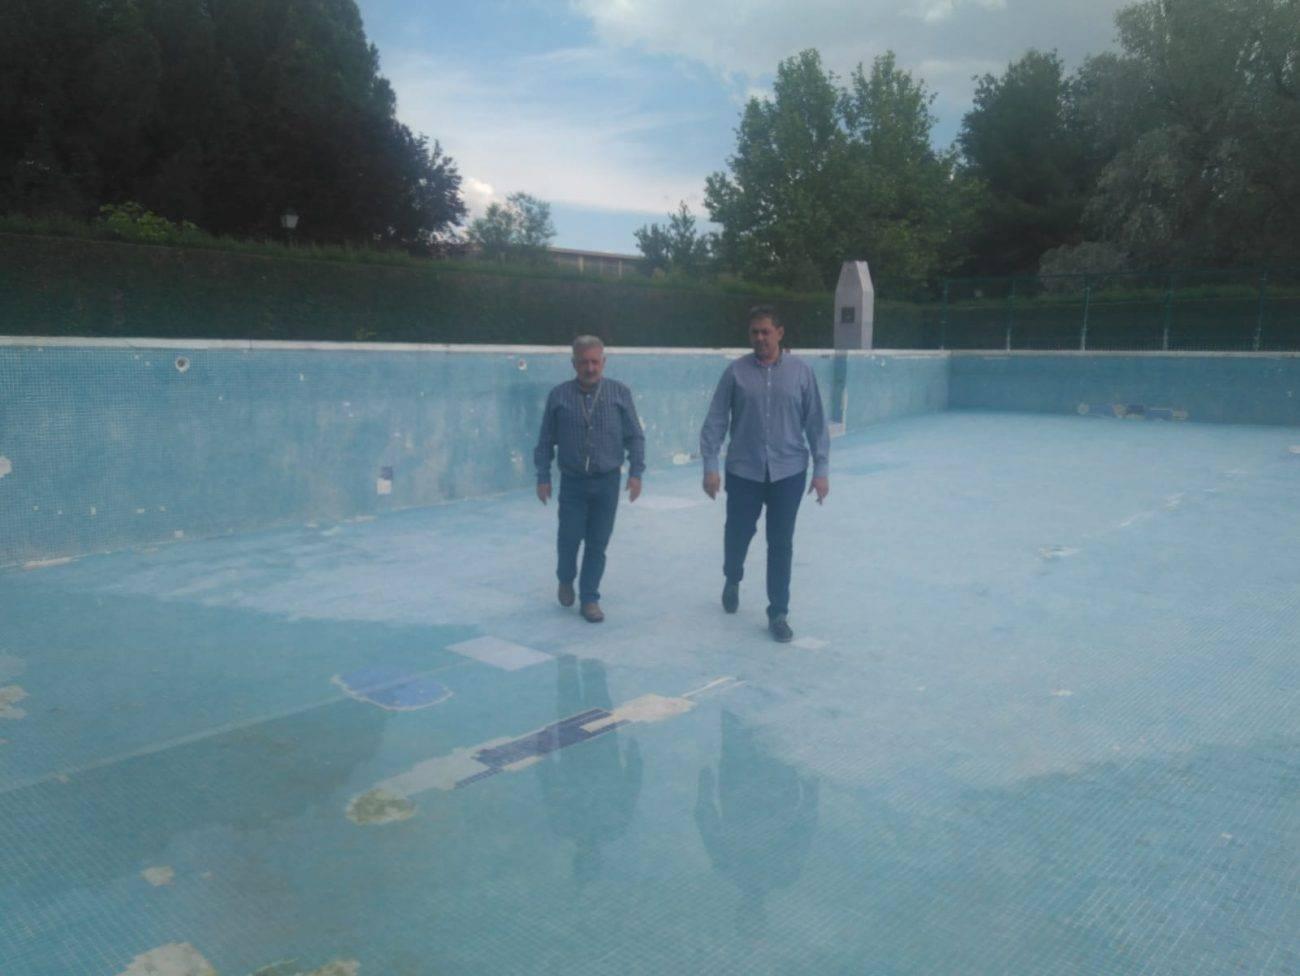 revisi%C3%B3n piscina municipal de herencia - La Piscina Municipal abrirá sus puertas el 15 de junio